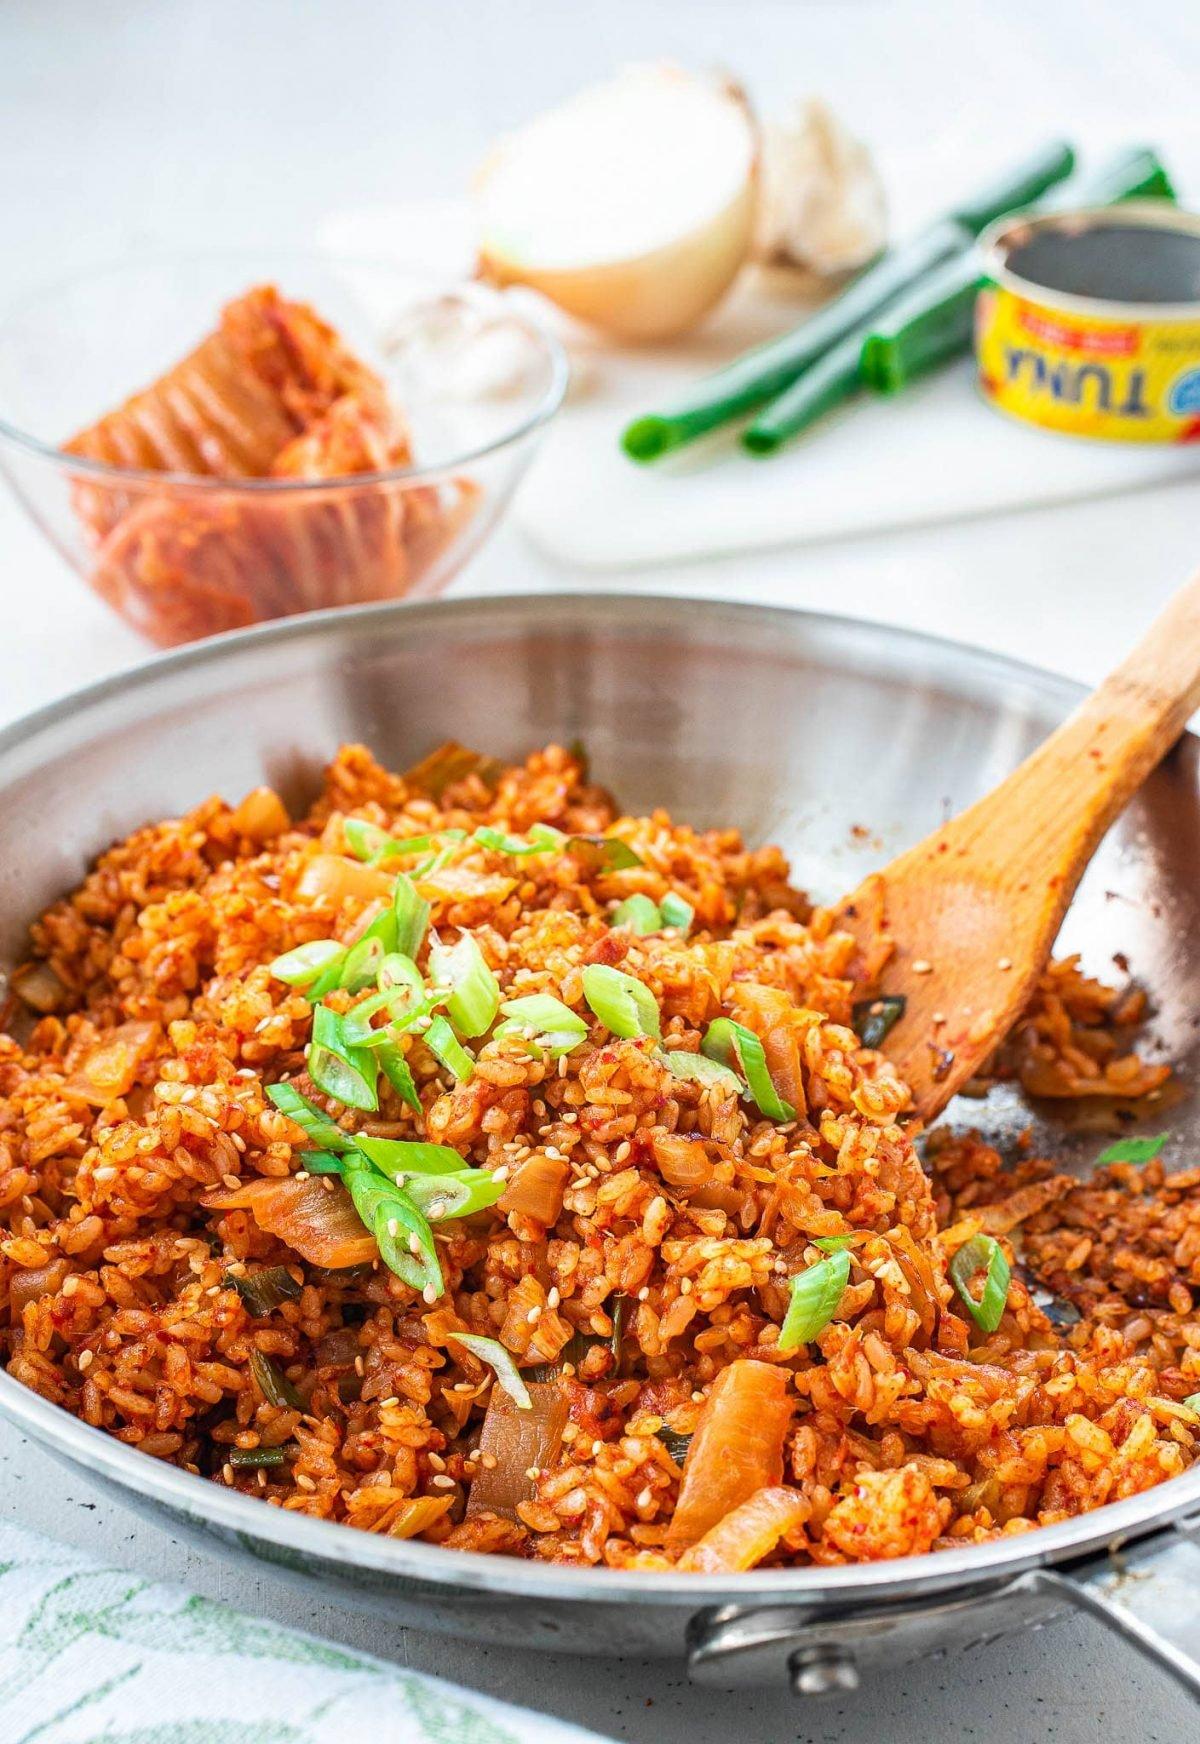 DSC6052 4 1 e1616386098951 - Kimchi Fried Rice (Kimchi Bokkeum Bap)